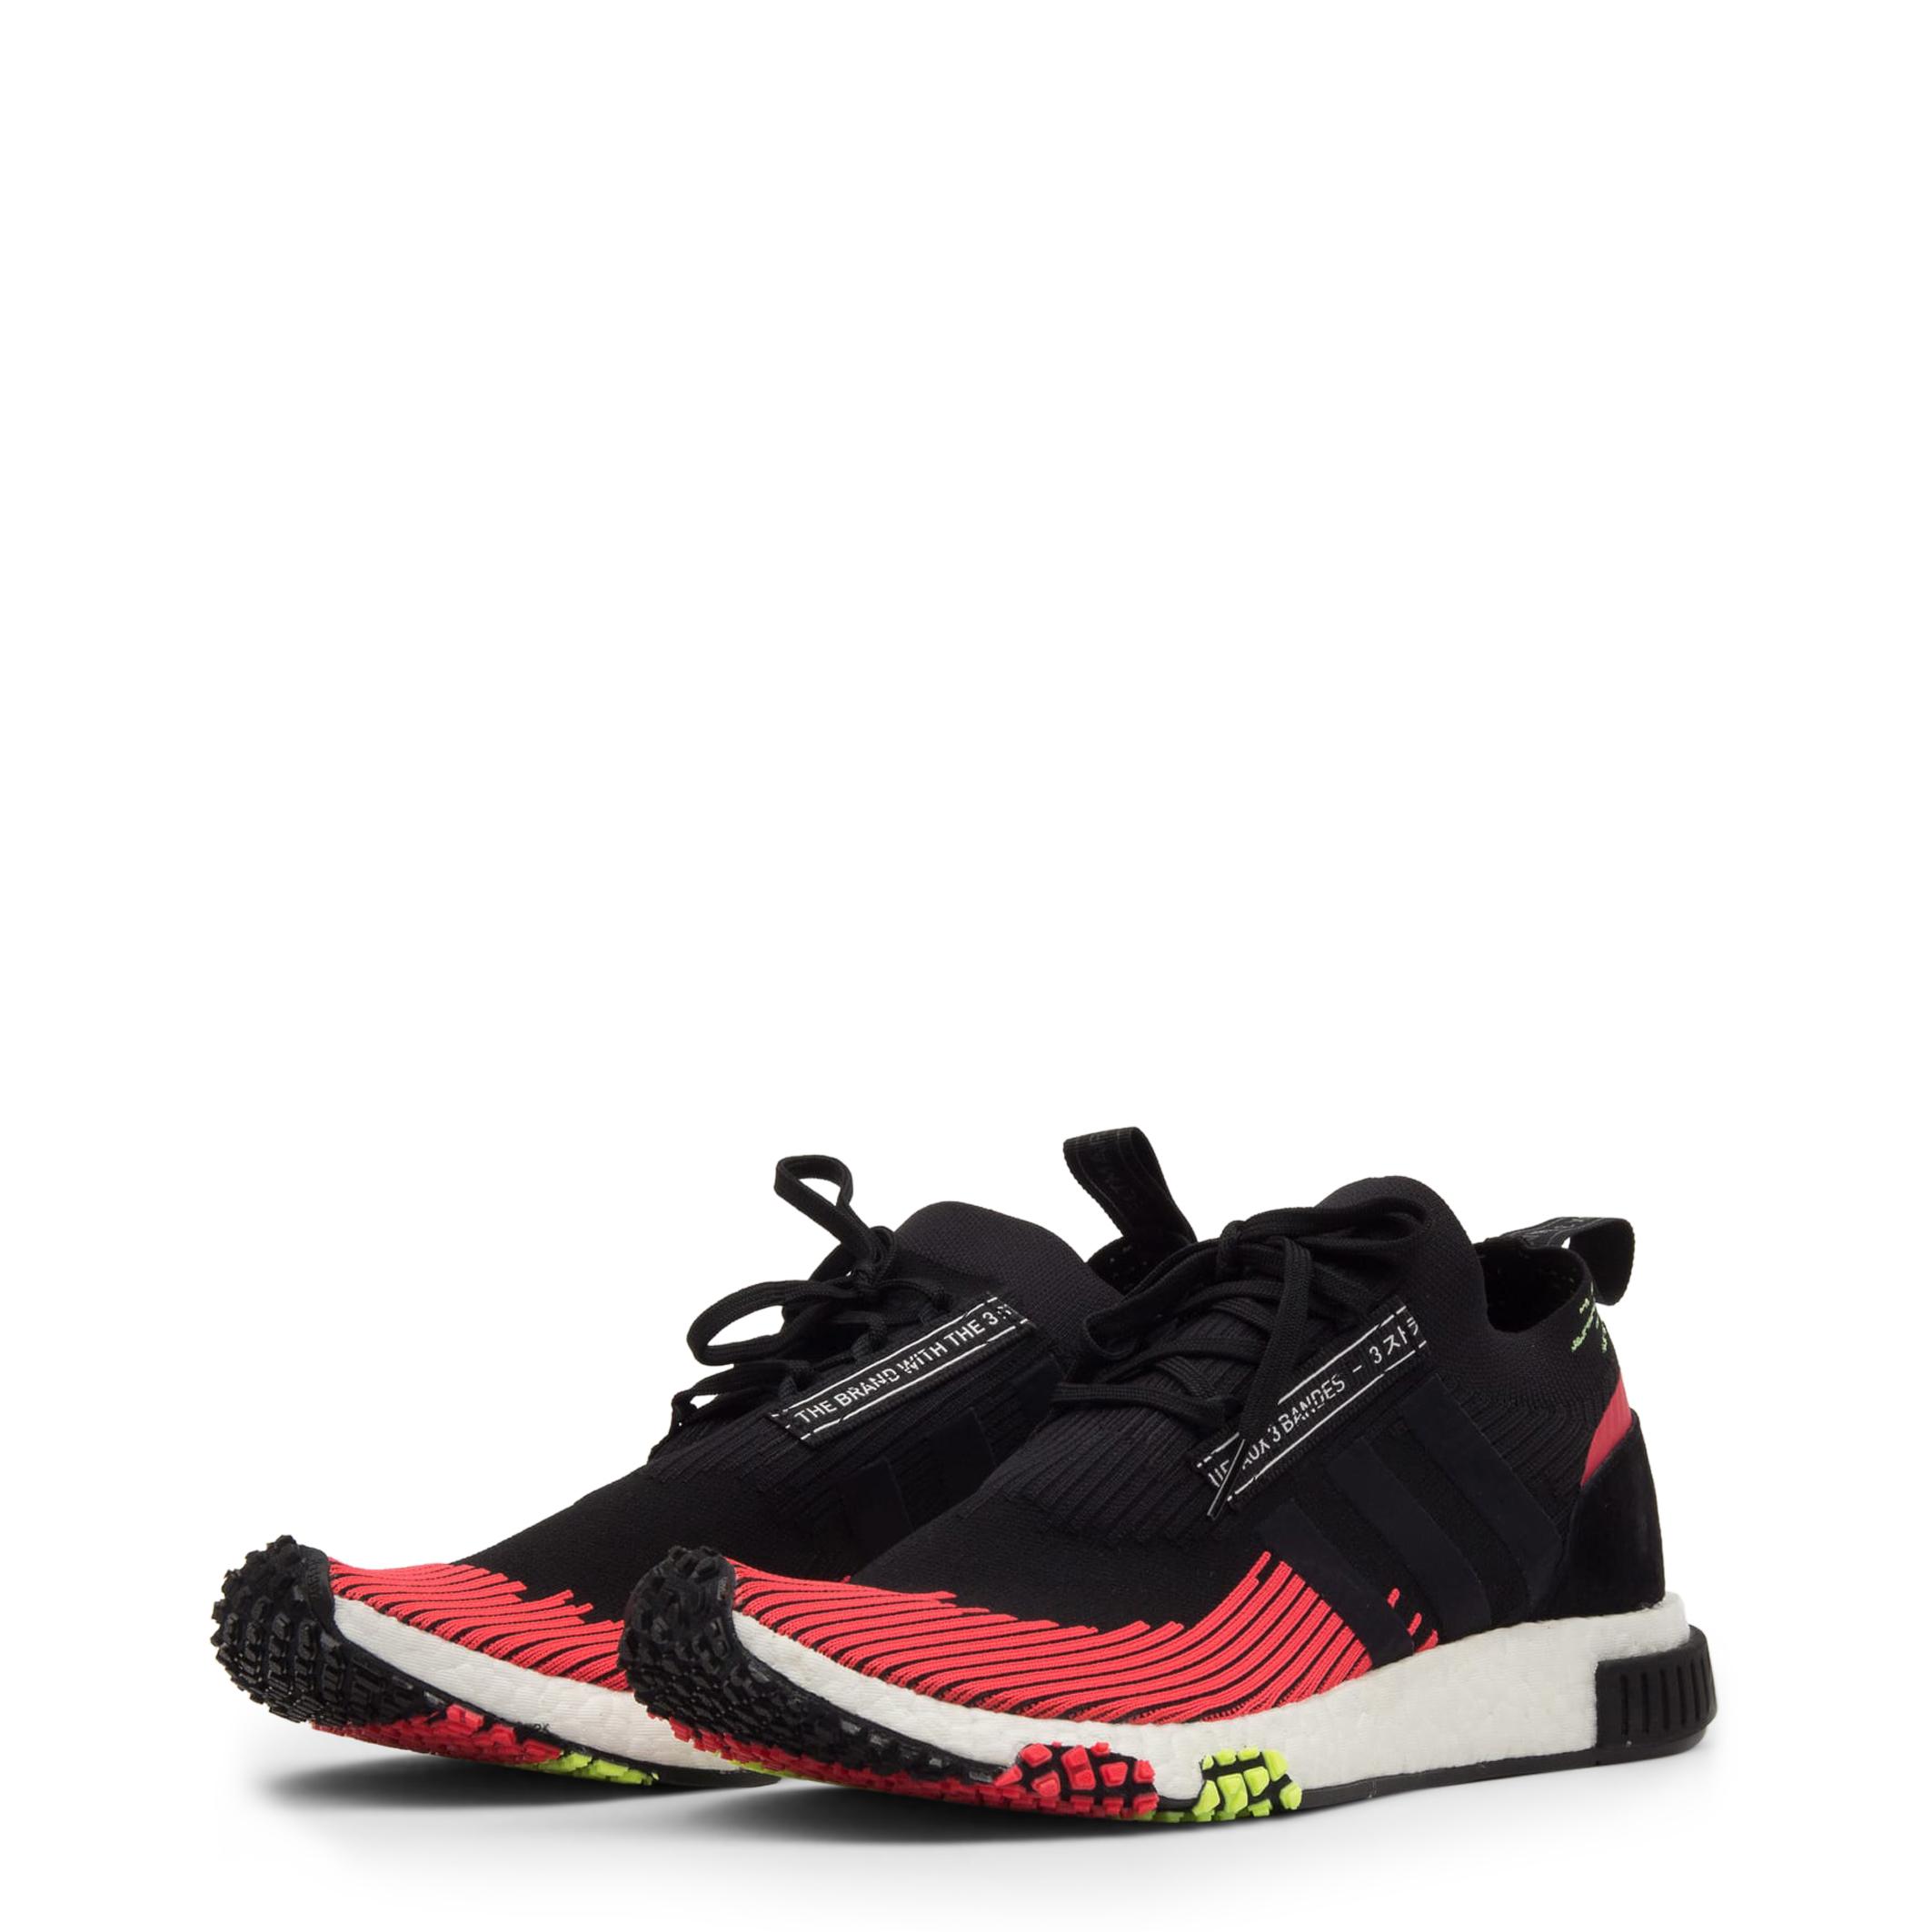 Sneakers Adidas NMD-RACER Unisex Nero 101535